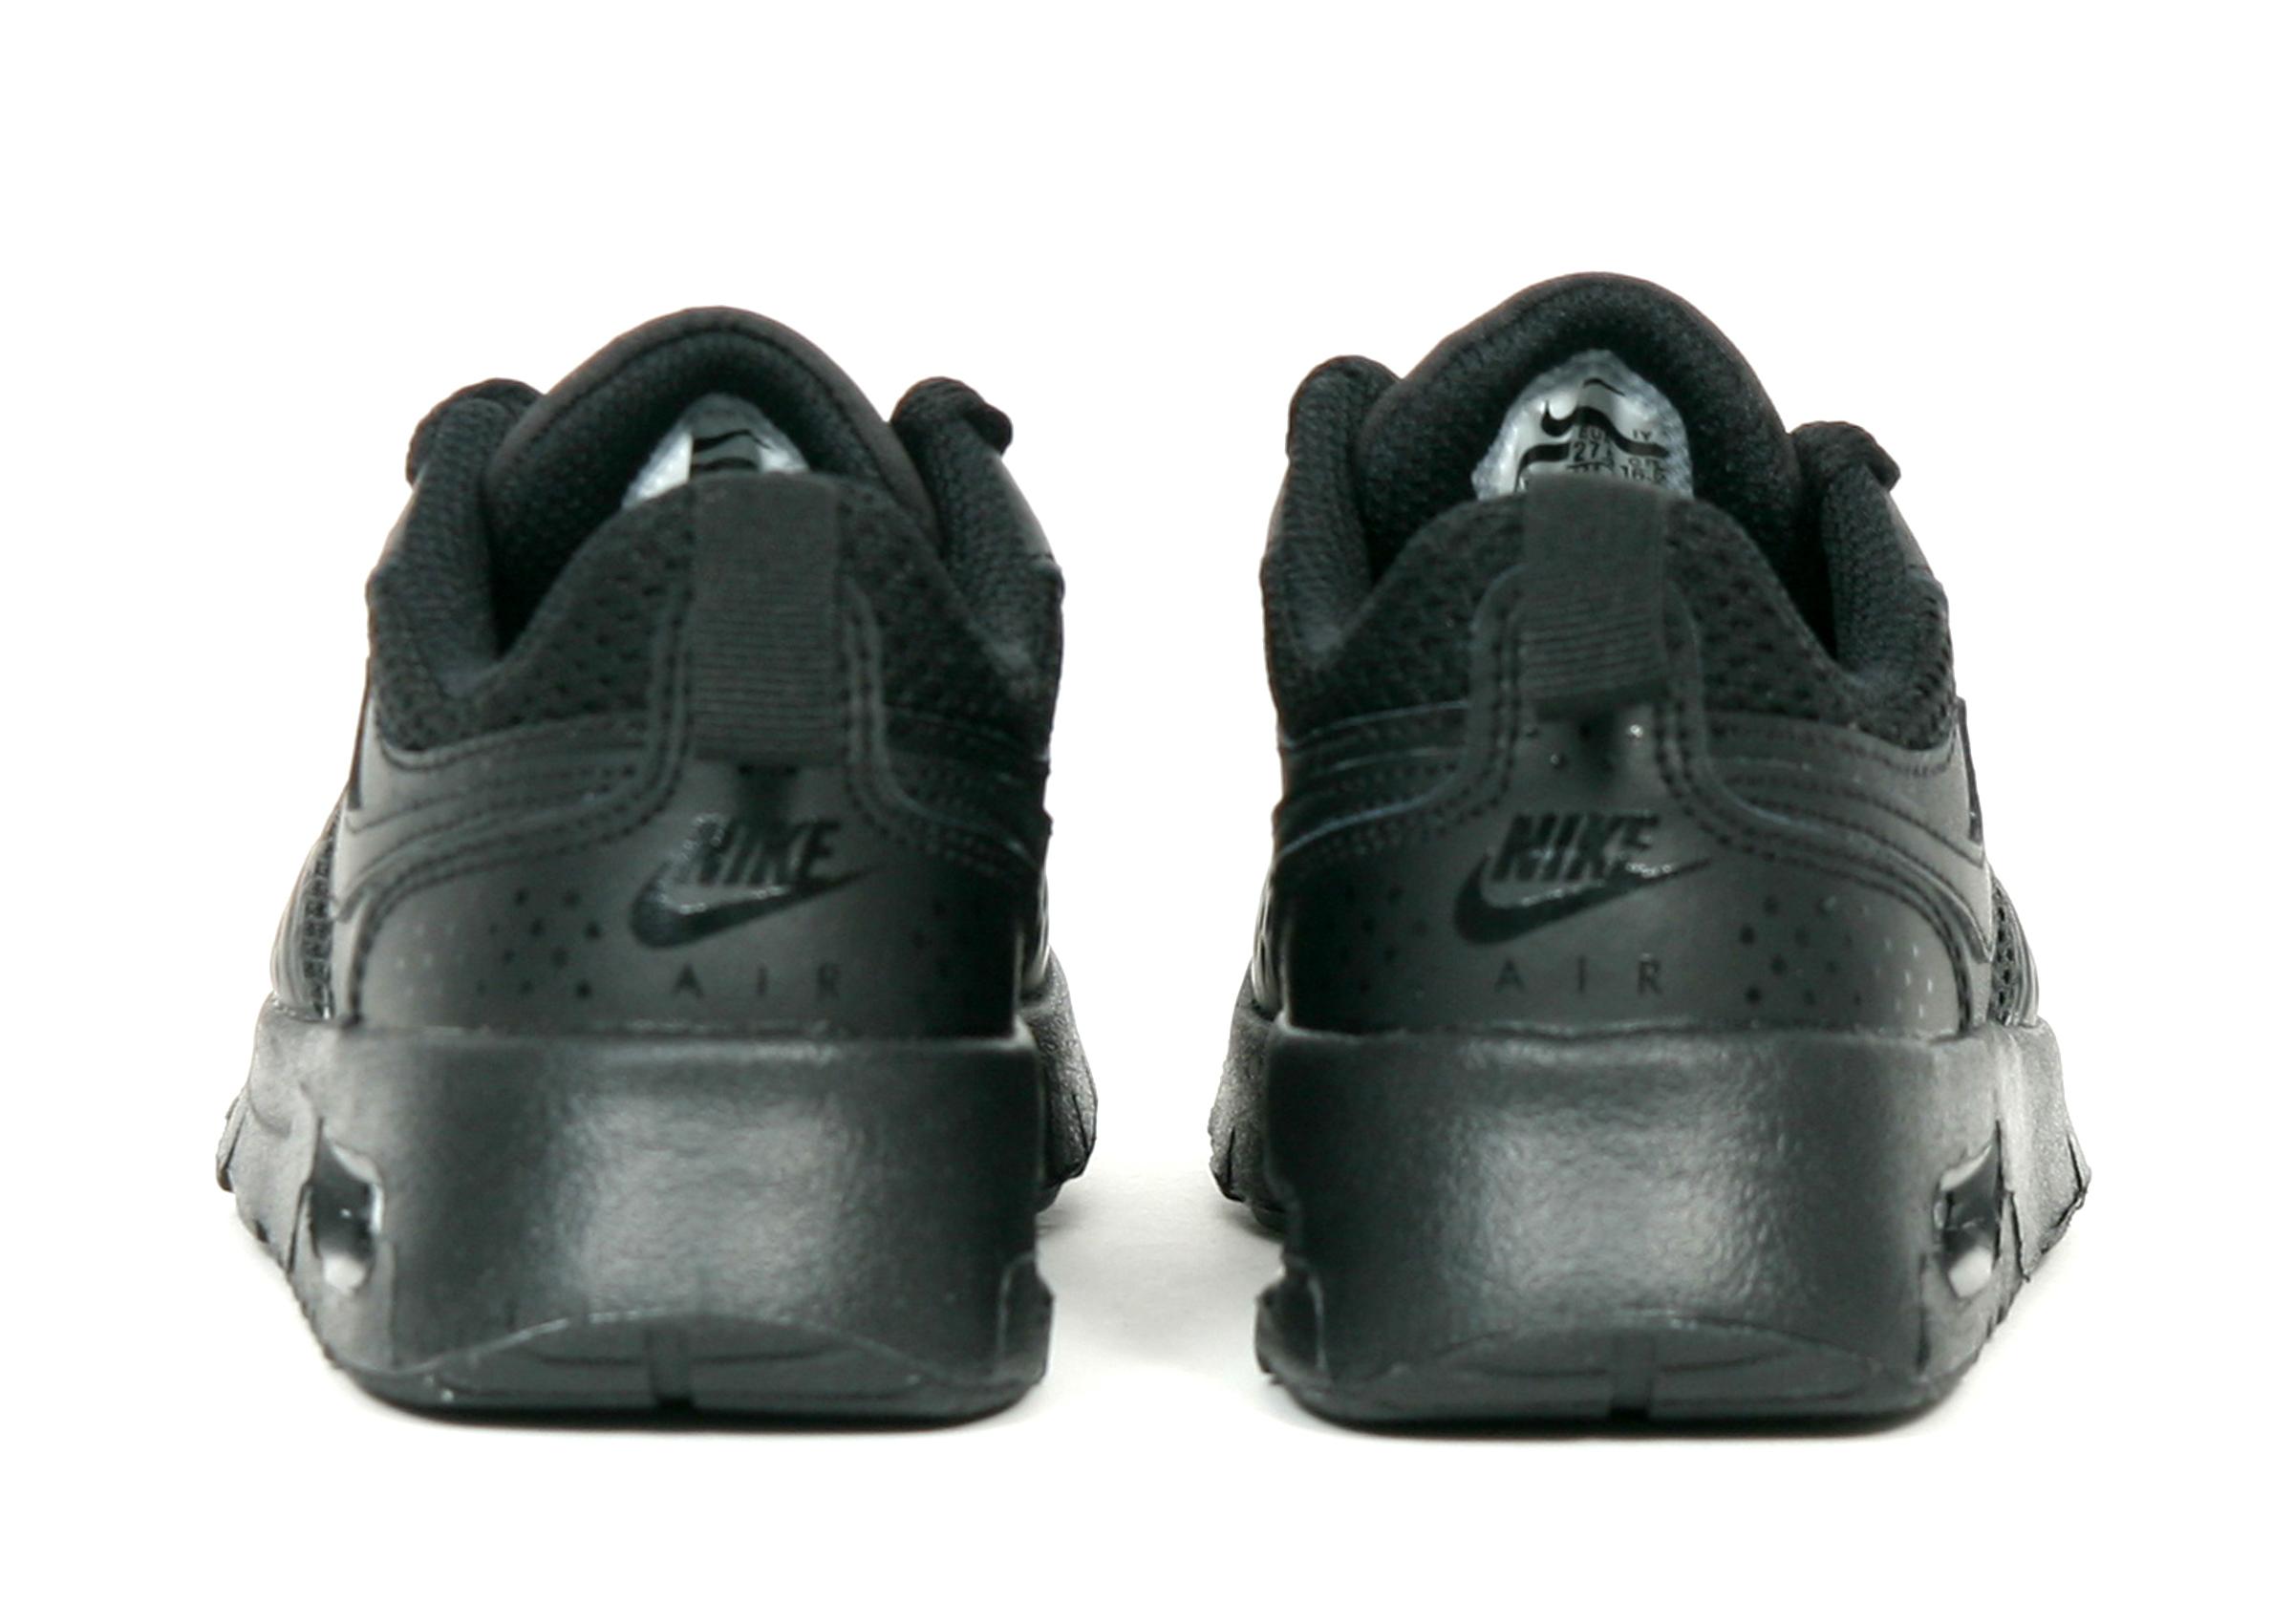 Buty Nike Air Max Vision Ps 917858 003 rozm. 28,5 Ceny i